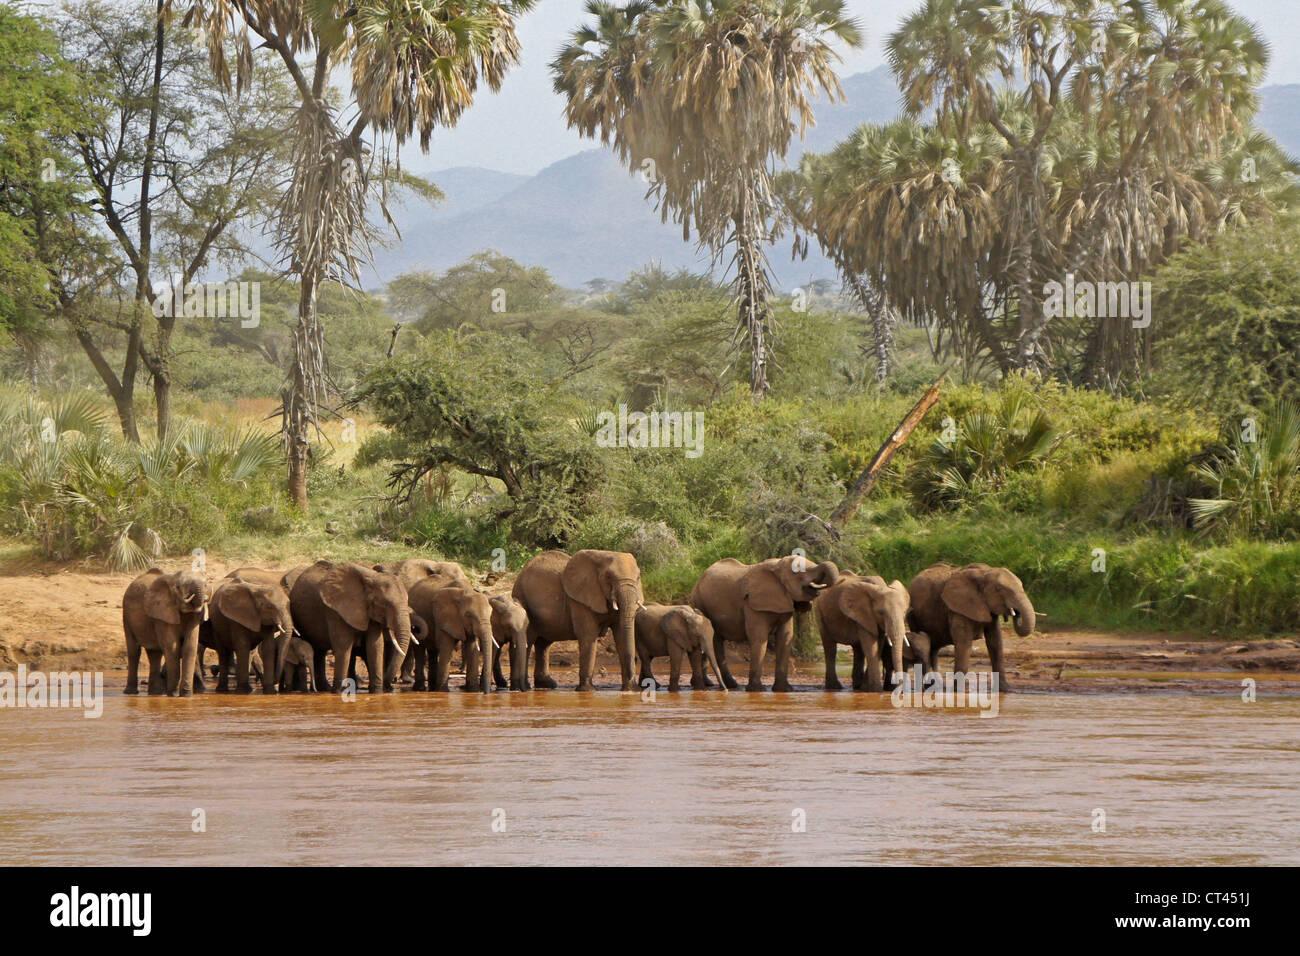 Herd of elephants drinking at Ewaso (Uaso) Nyiro river, Samburu, Kenya - Stock Image